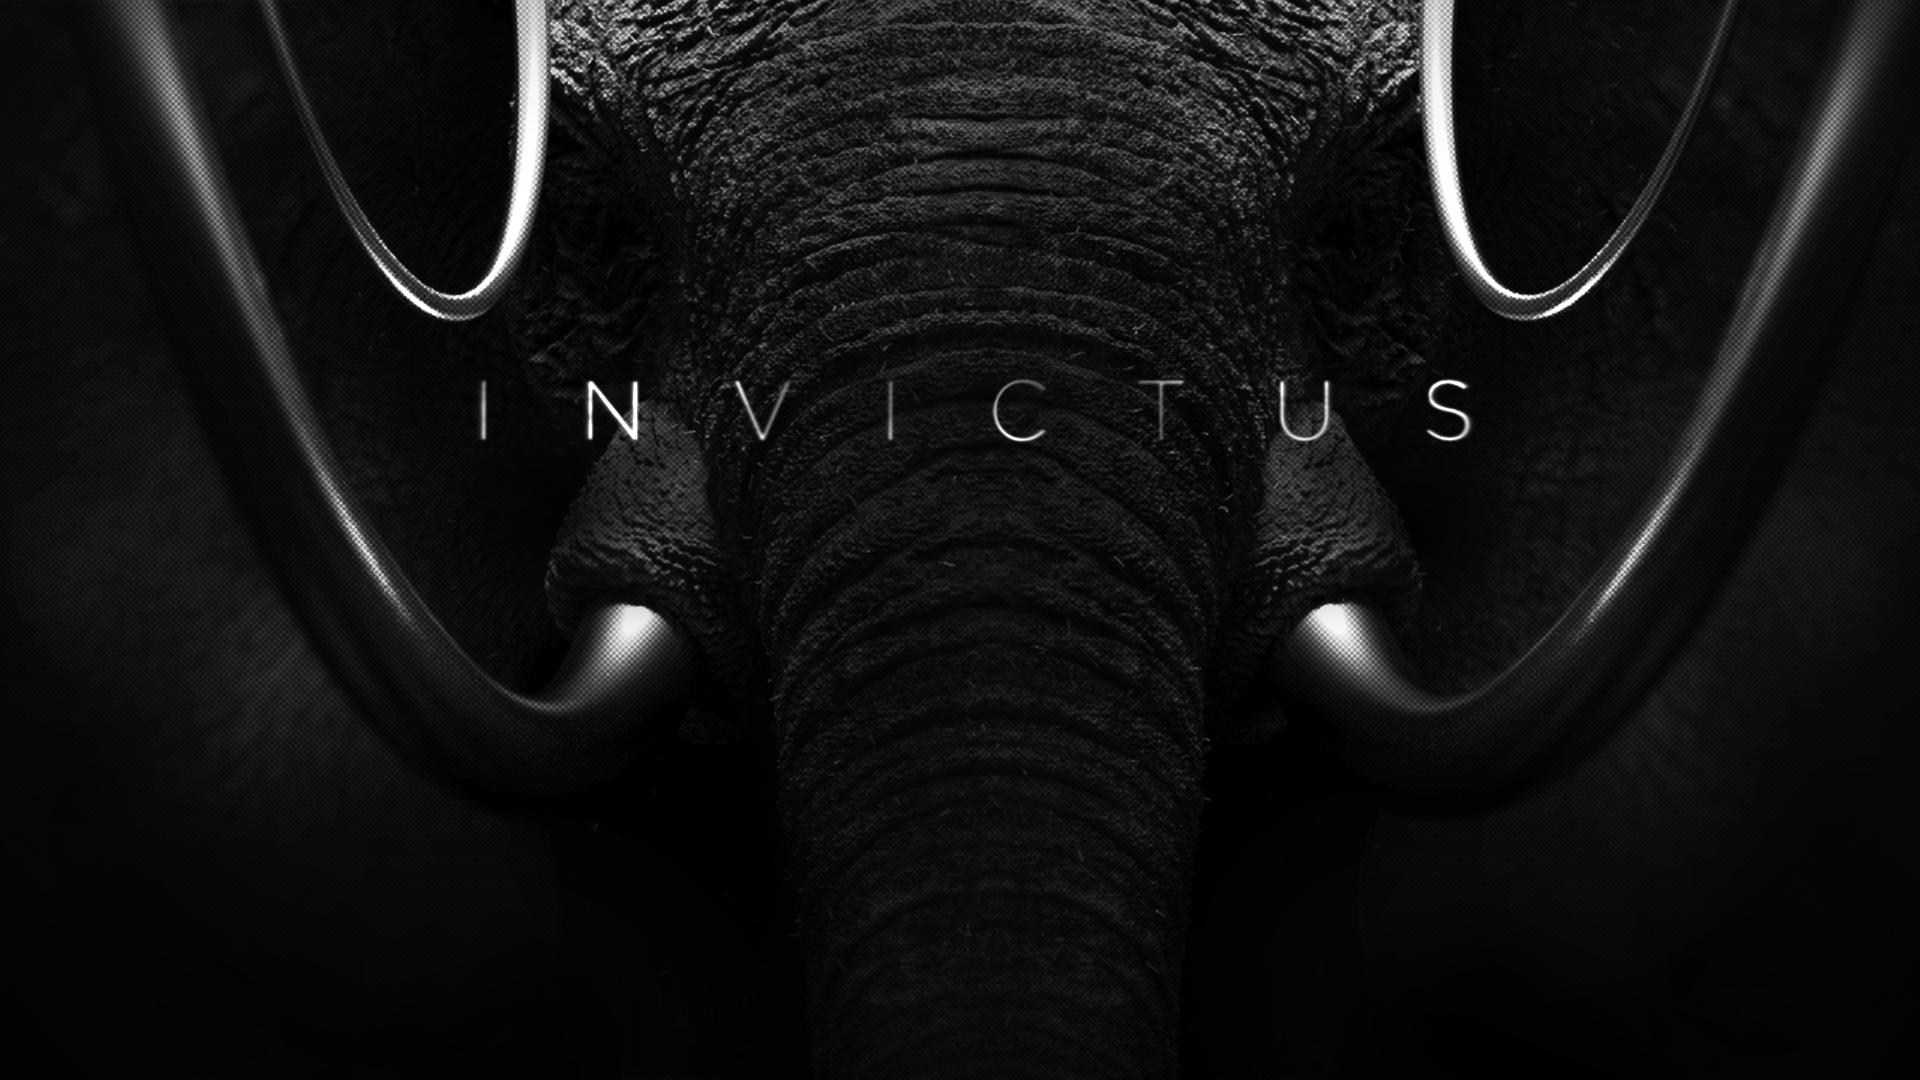 INVICTUS_SMI_01CL